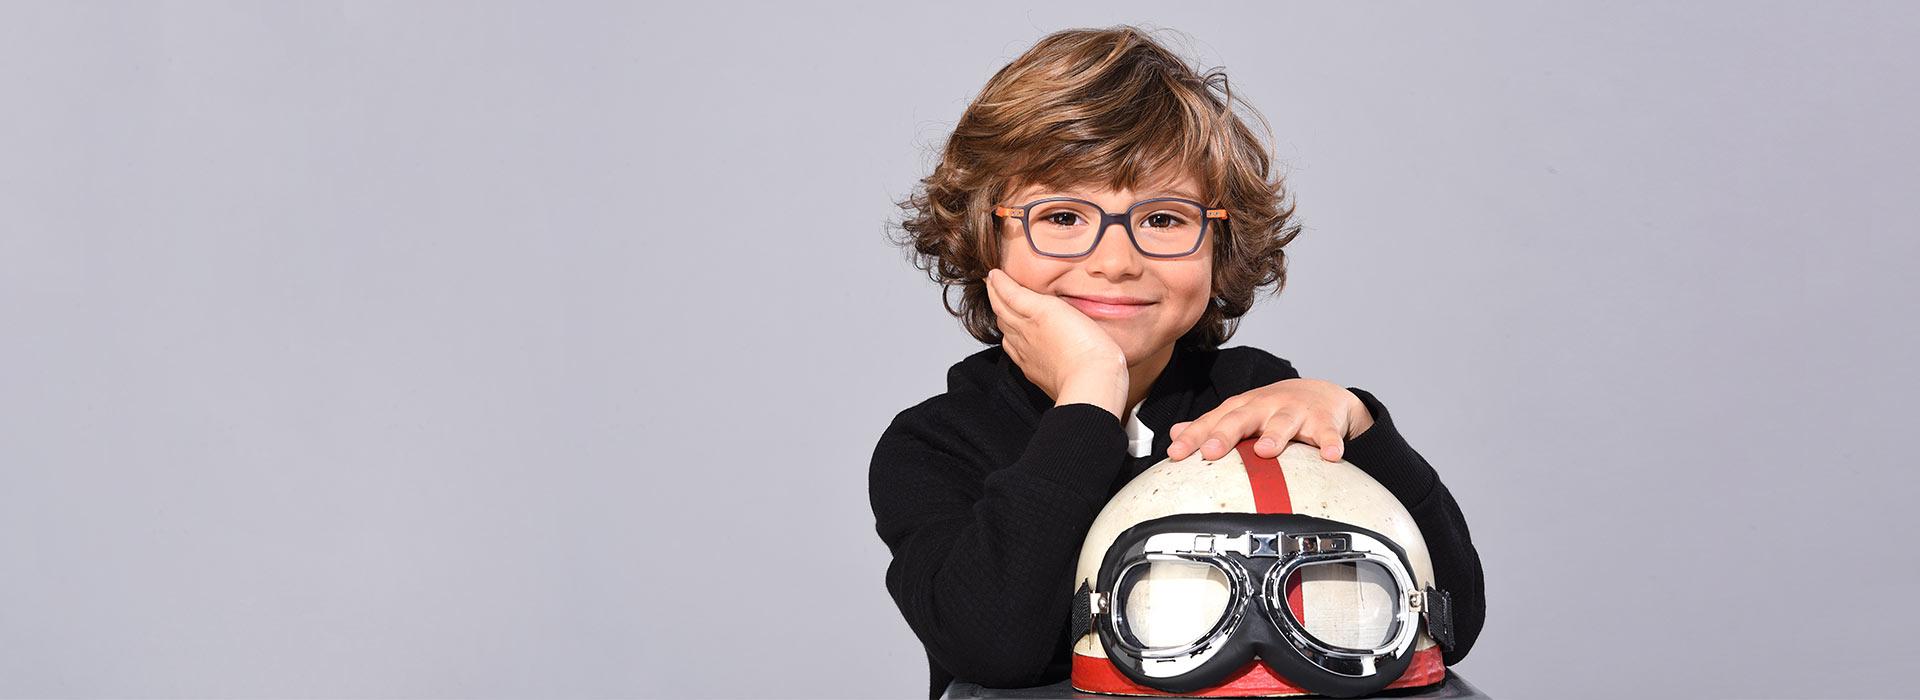 lunettes cars garçon